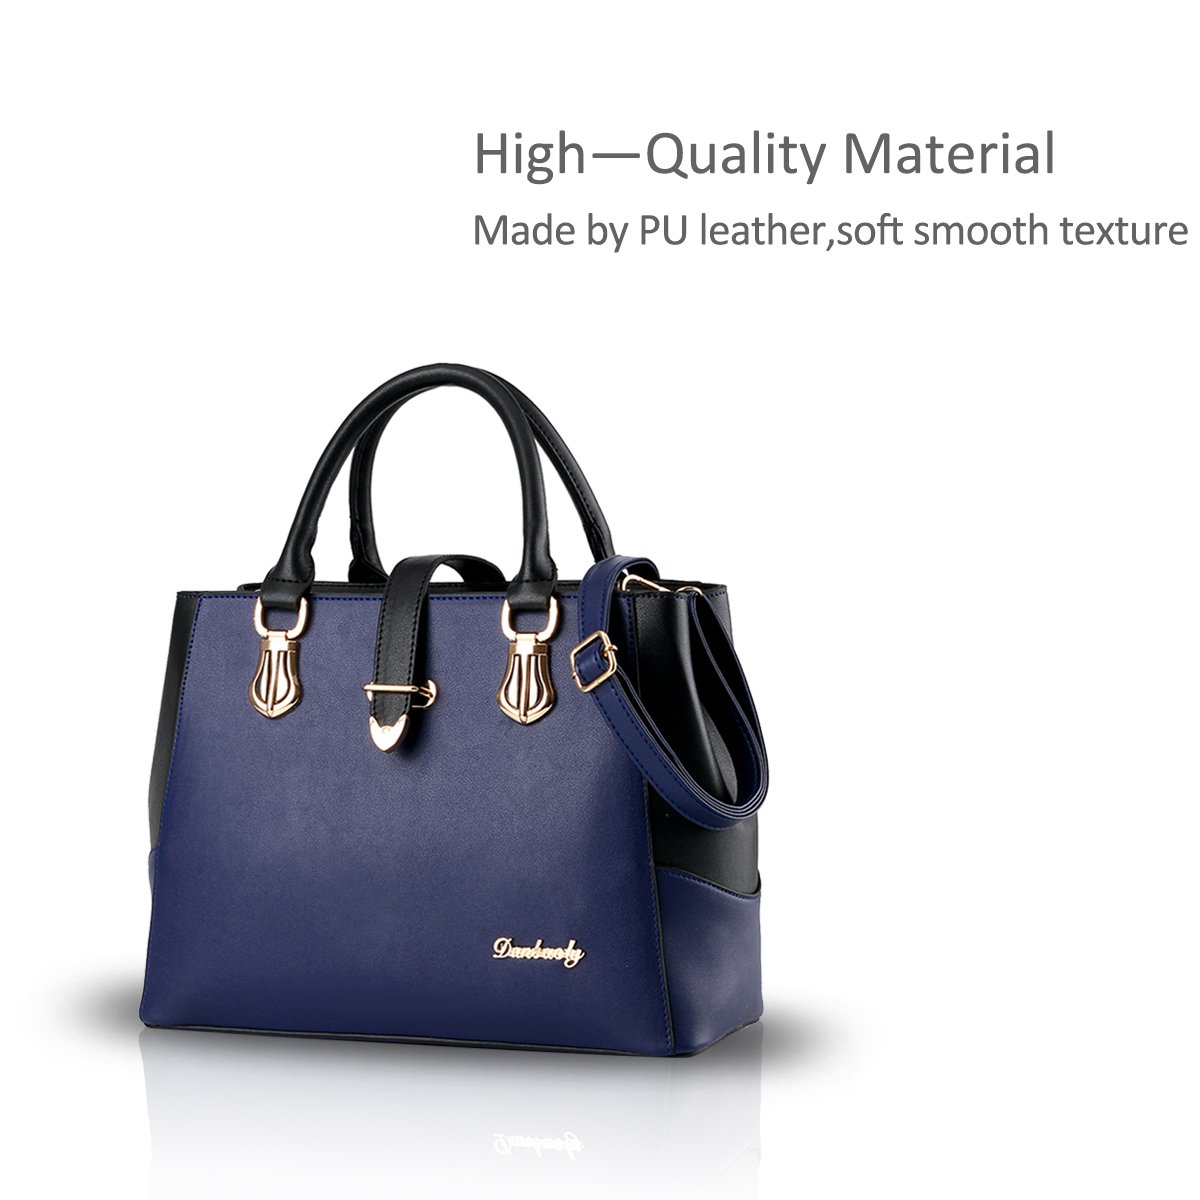 a65b8730486a Nicole   Doris 2016 new black and white faishon style handbag casual  shoulder bag cross-body work ...